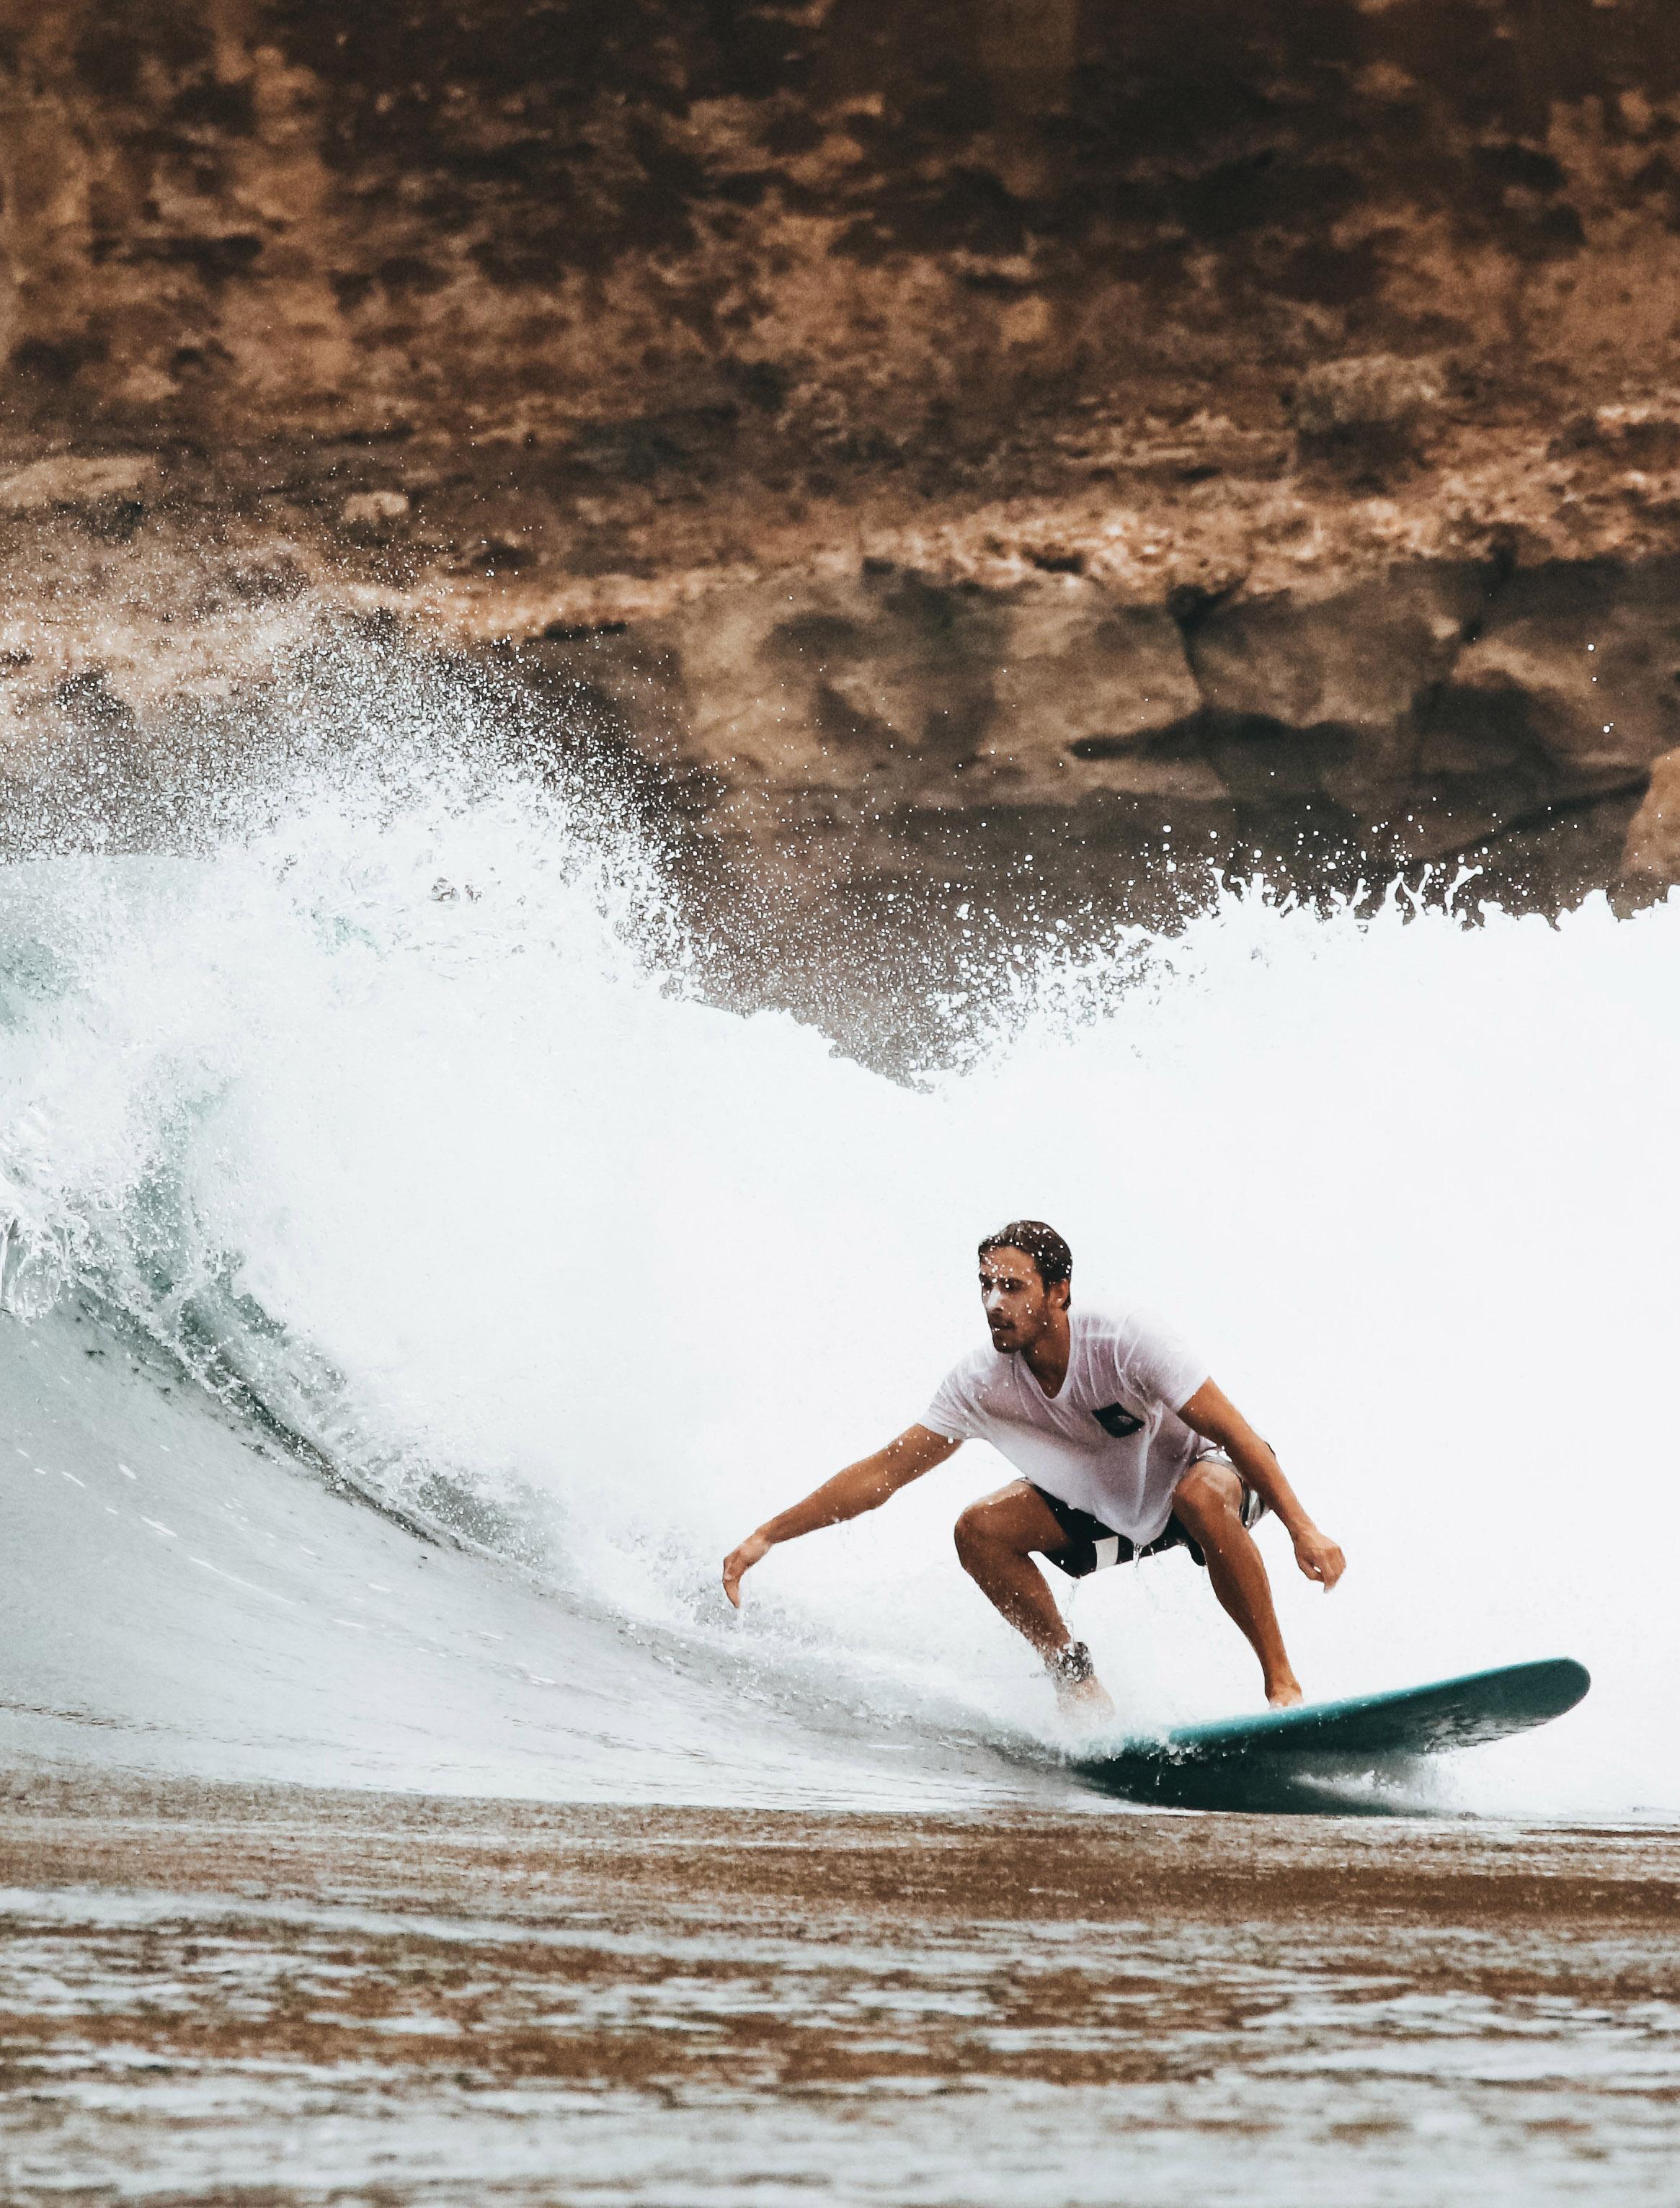 Man Surfing on Ocean Waves by Oliver Sjöström via Pexels #surfing #Hawaii #watersports   https://www.roseclearfield.com